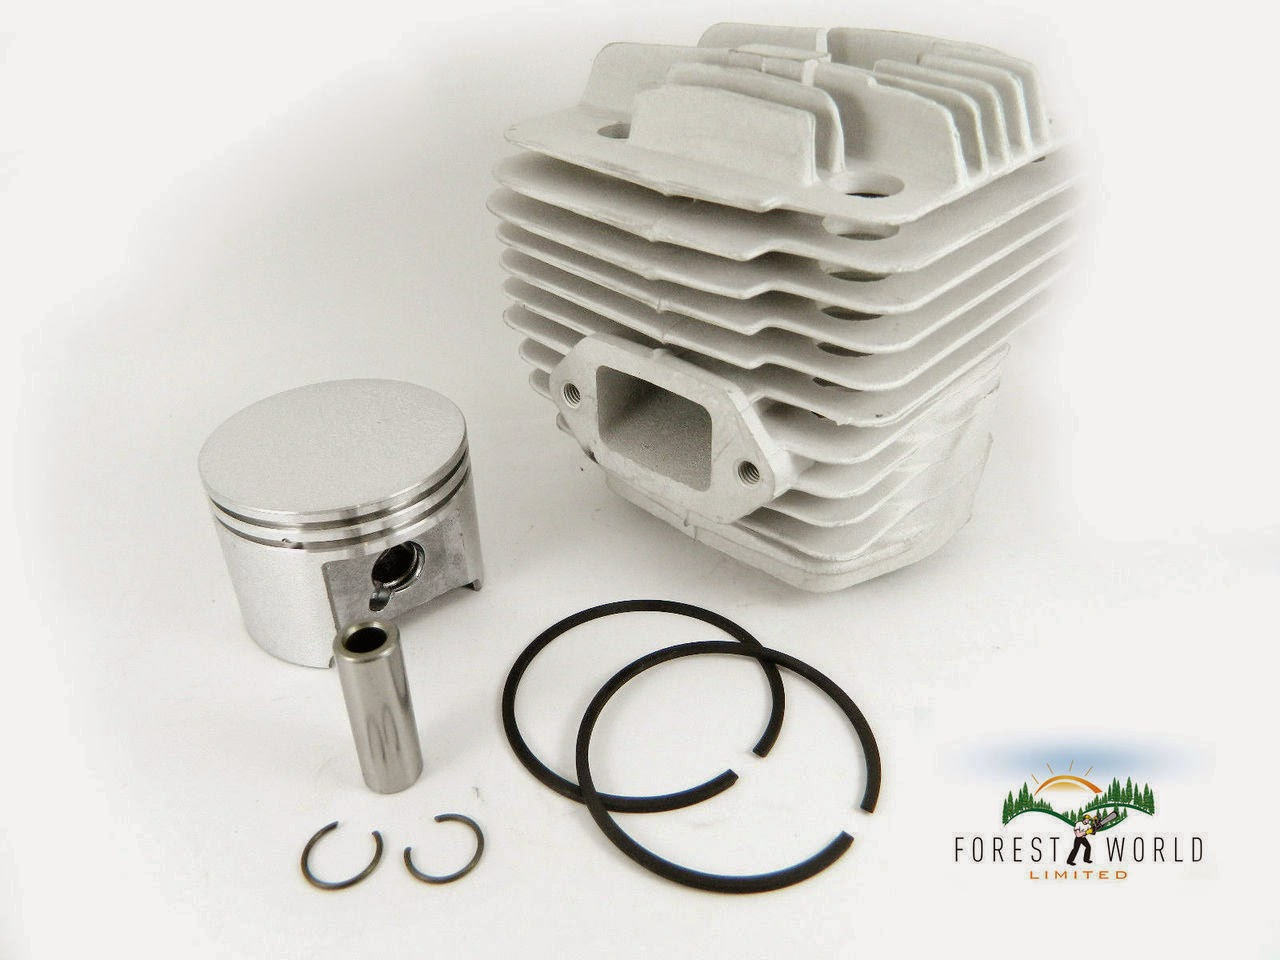 http://www.chainsawpartsonline.co.uk/stihl-concrete-stone-saw-cylinder-piston/